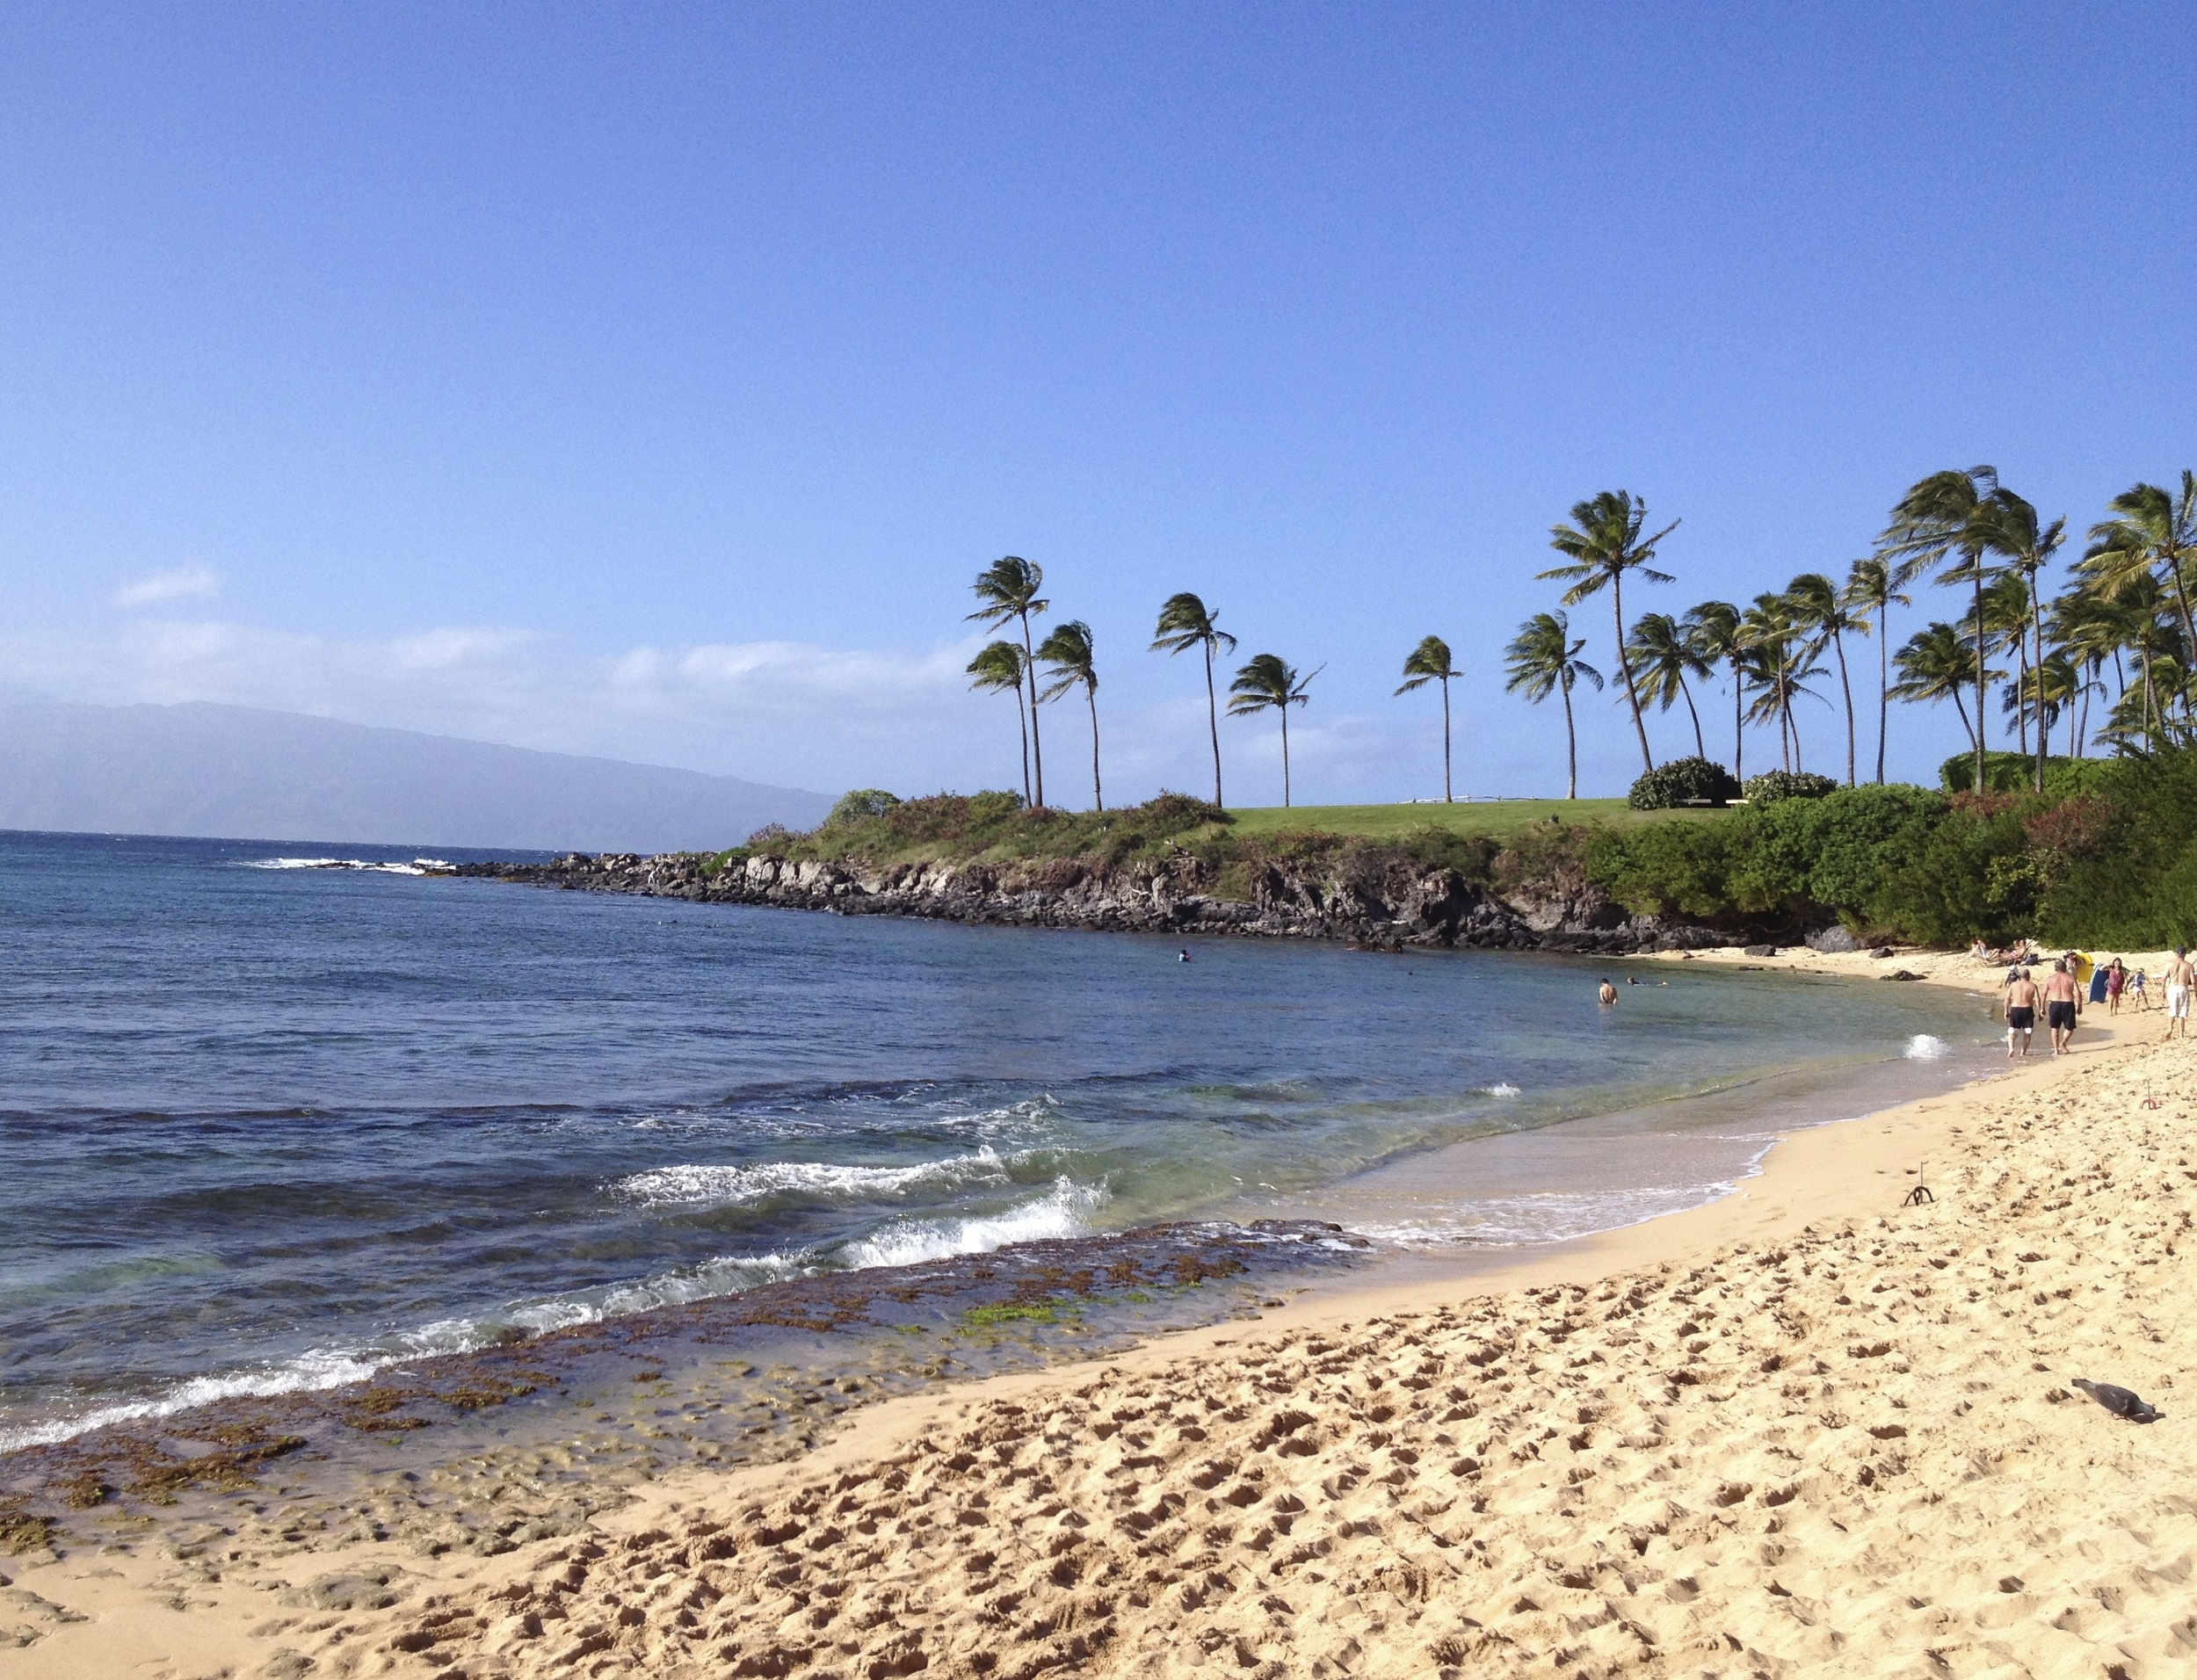 Maui, February 2013